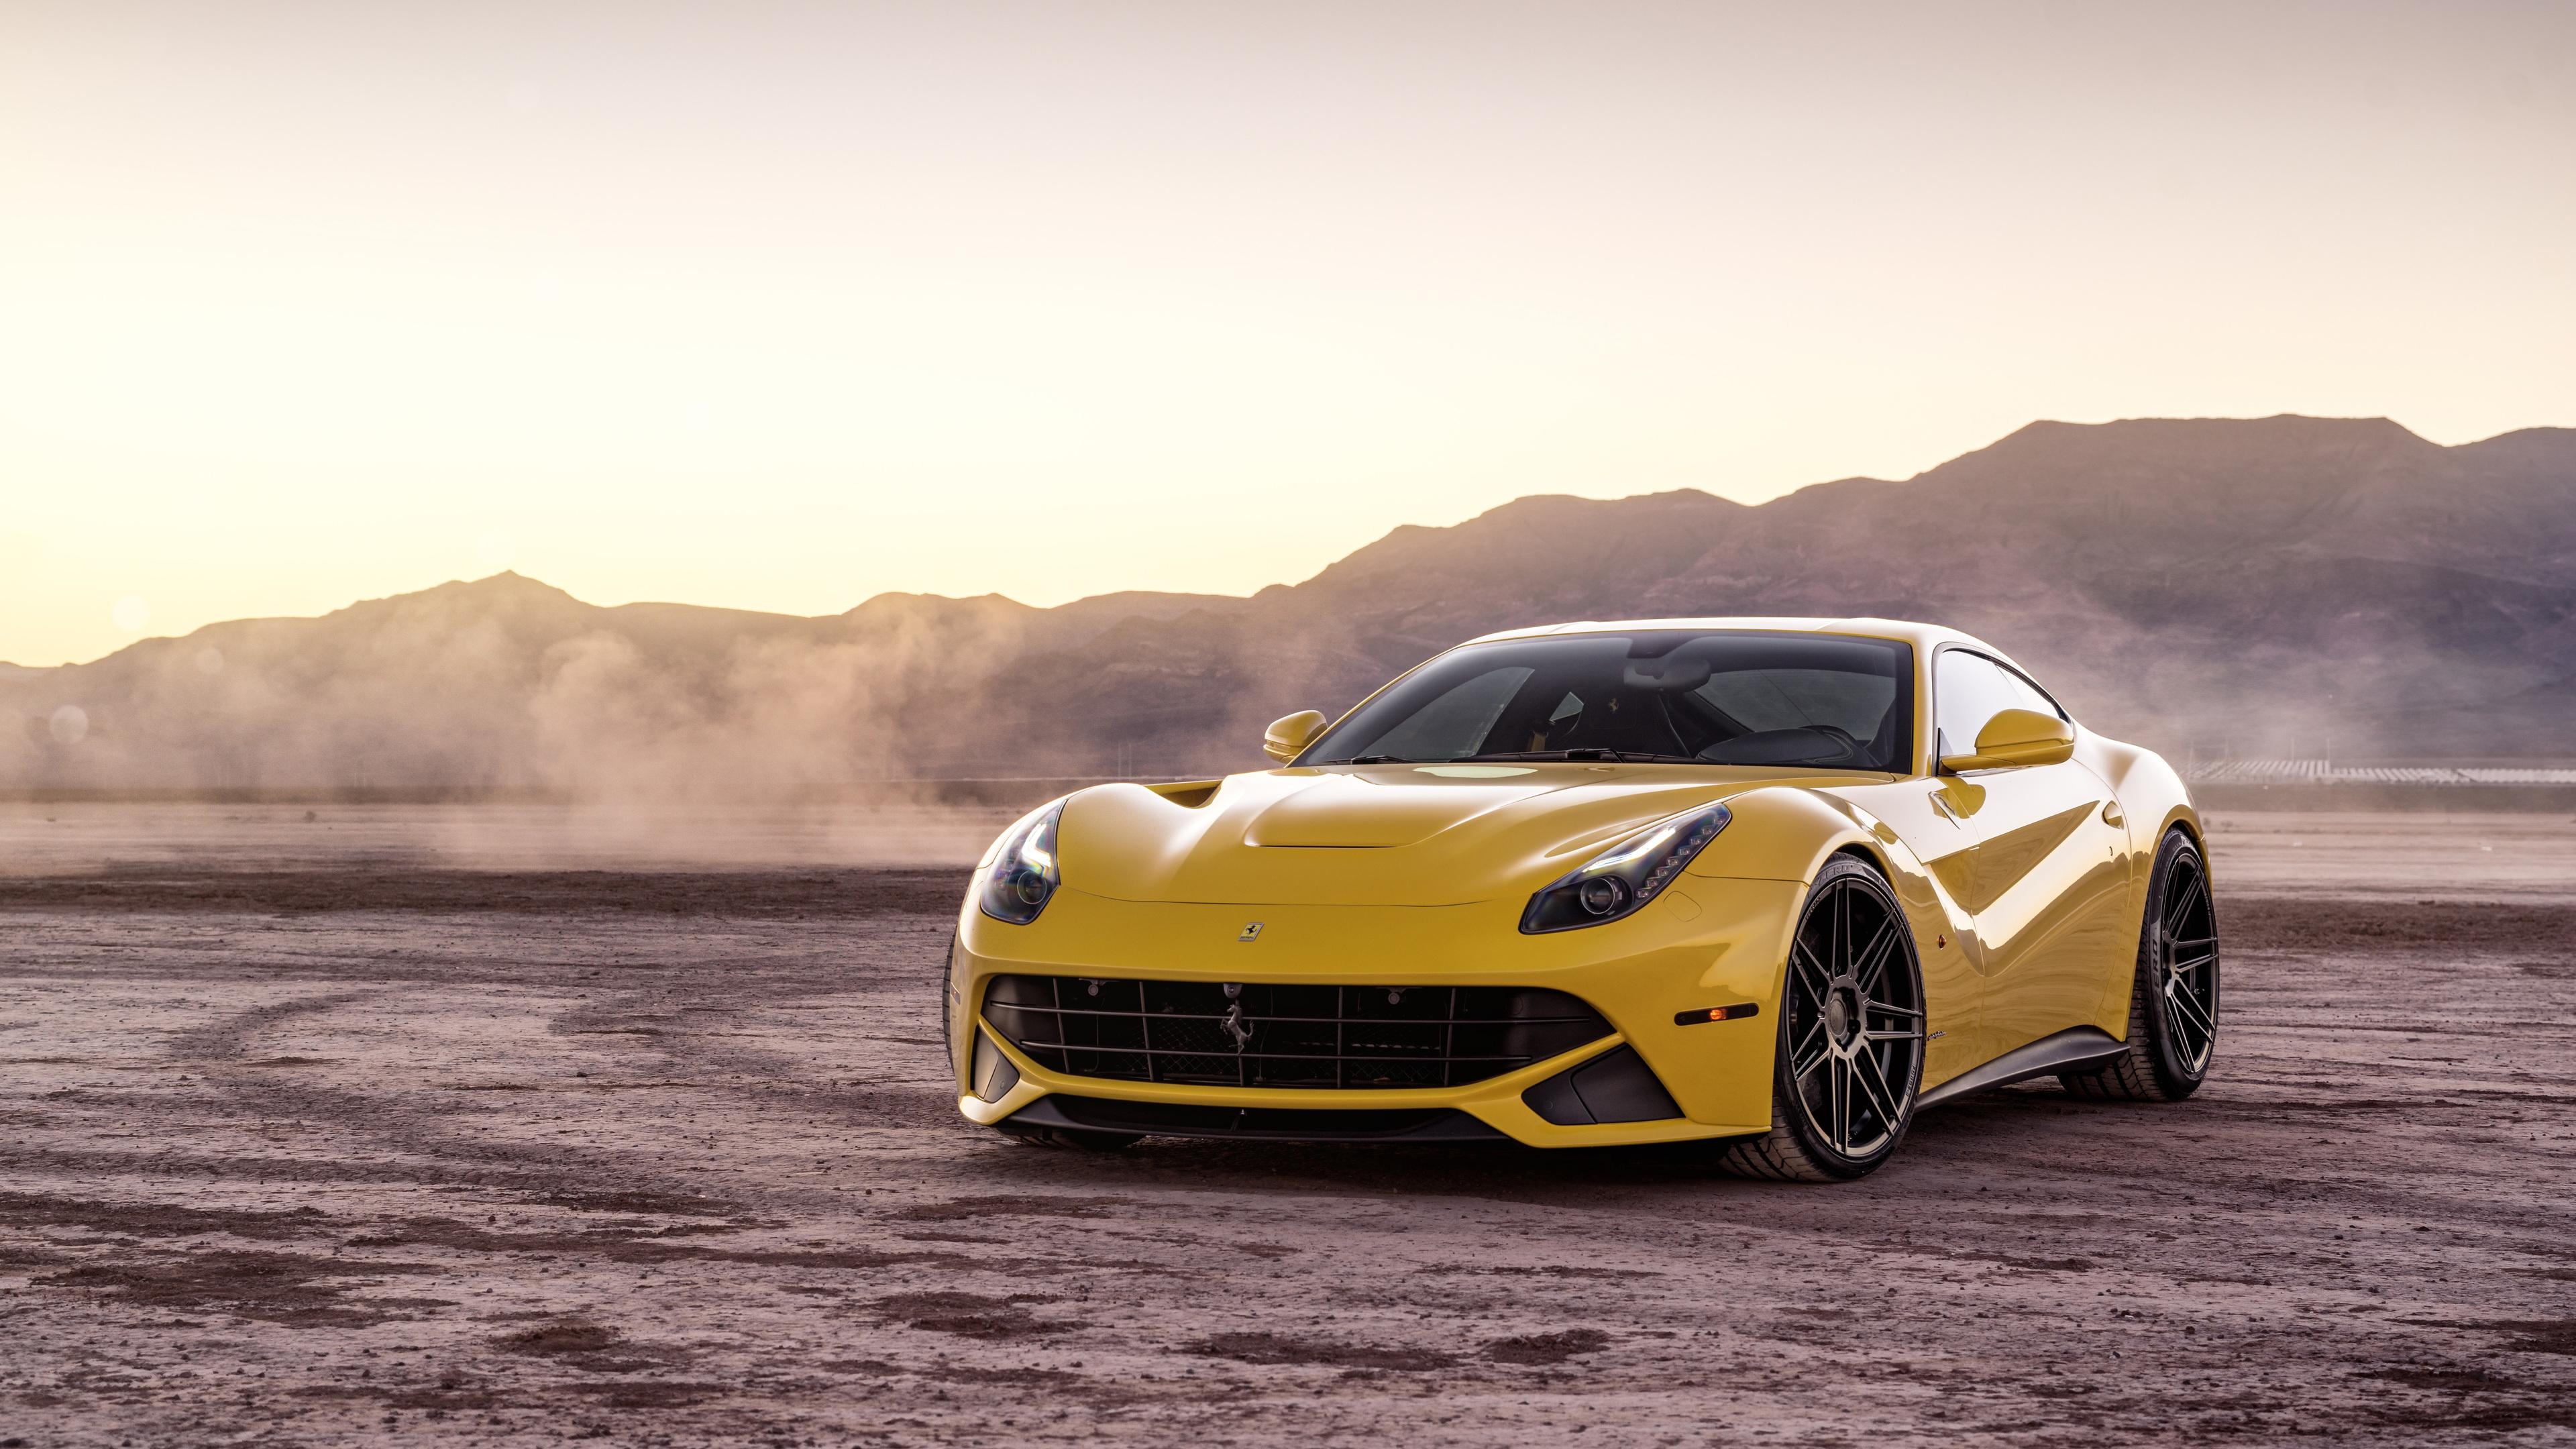 Yellow Ferrari Hd Wallpapers For Mobile